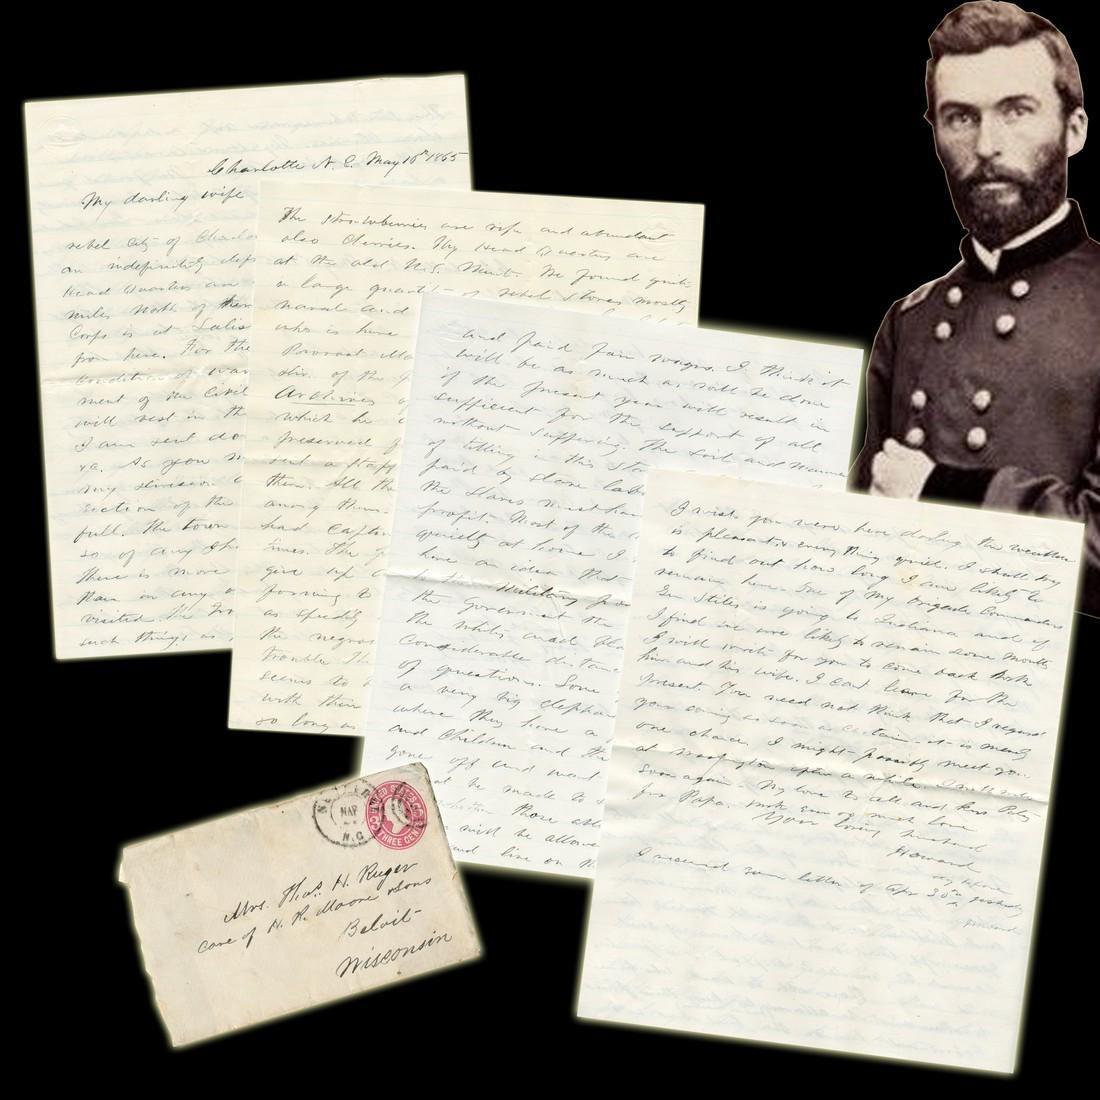 Union Gen. Thomas H. Ruger ALS Re: Reconstructing